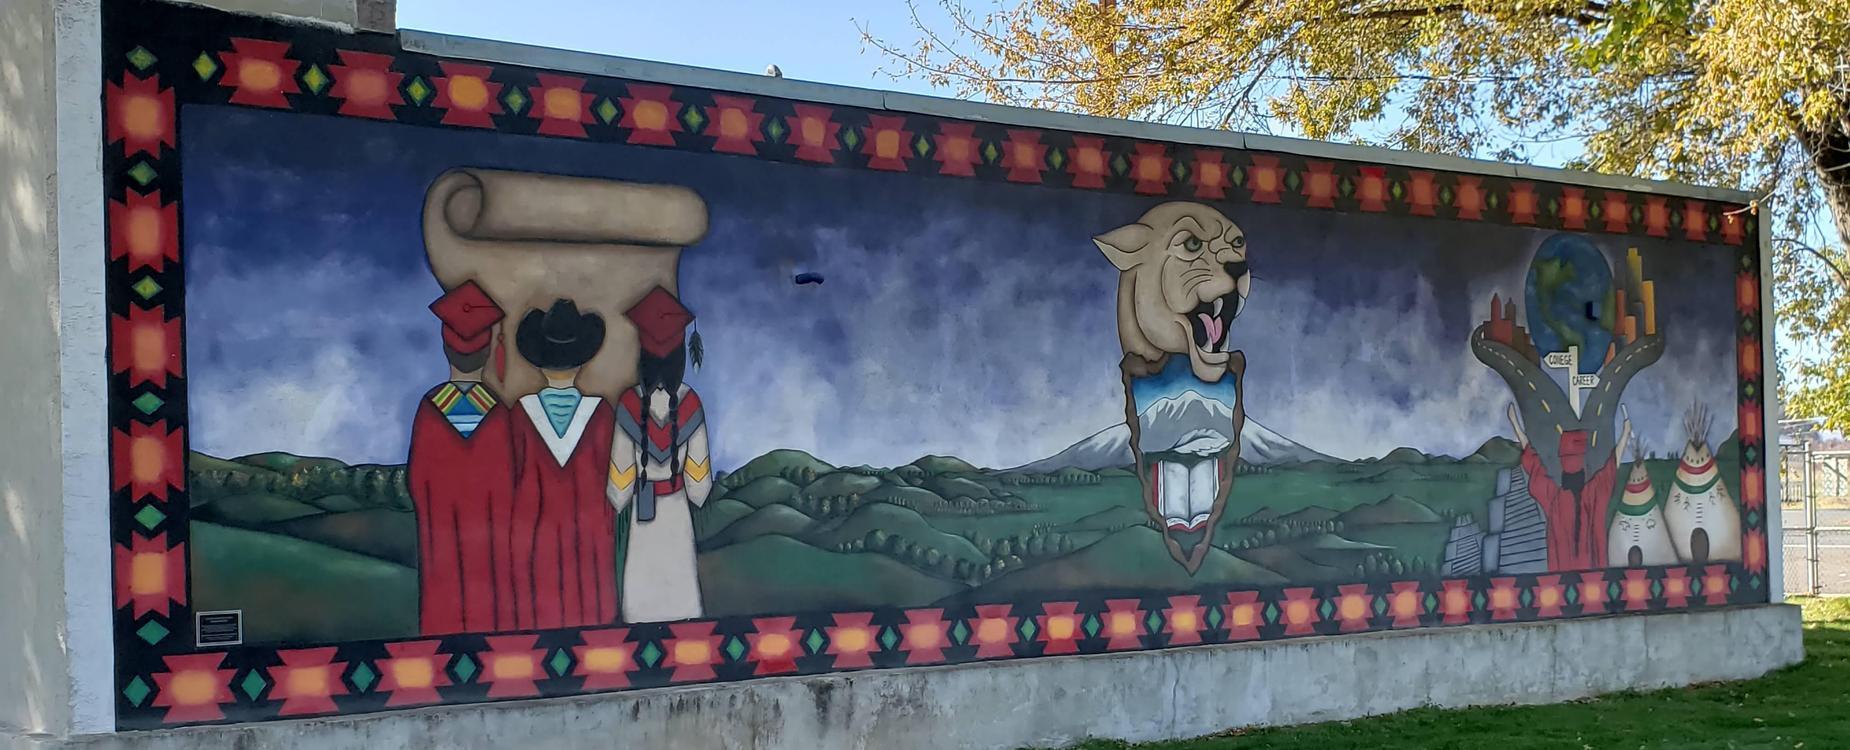 MAMS Graduation Mural